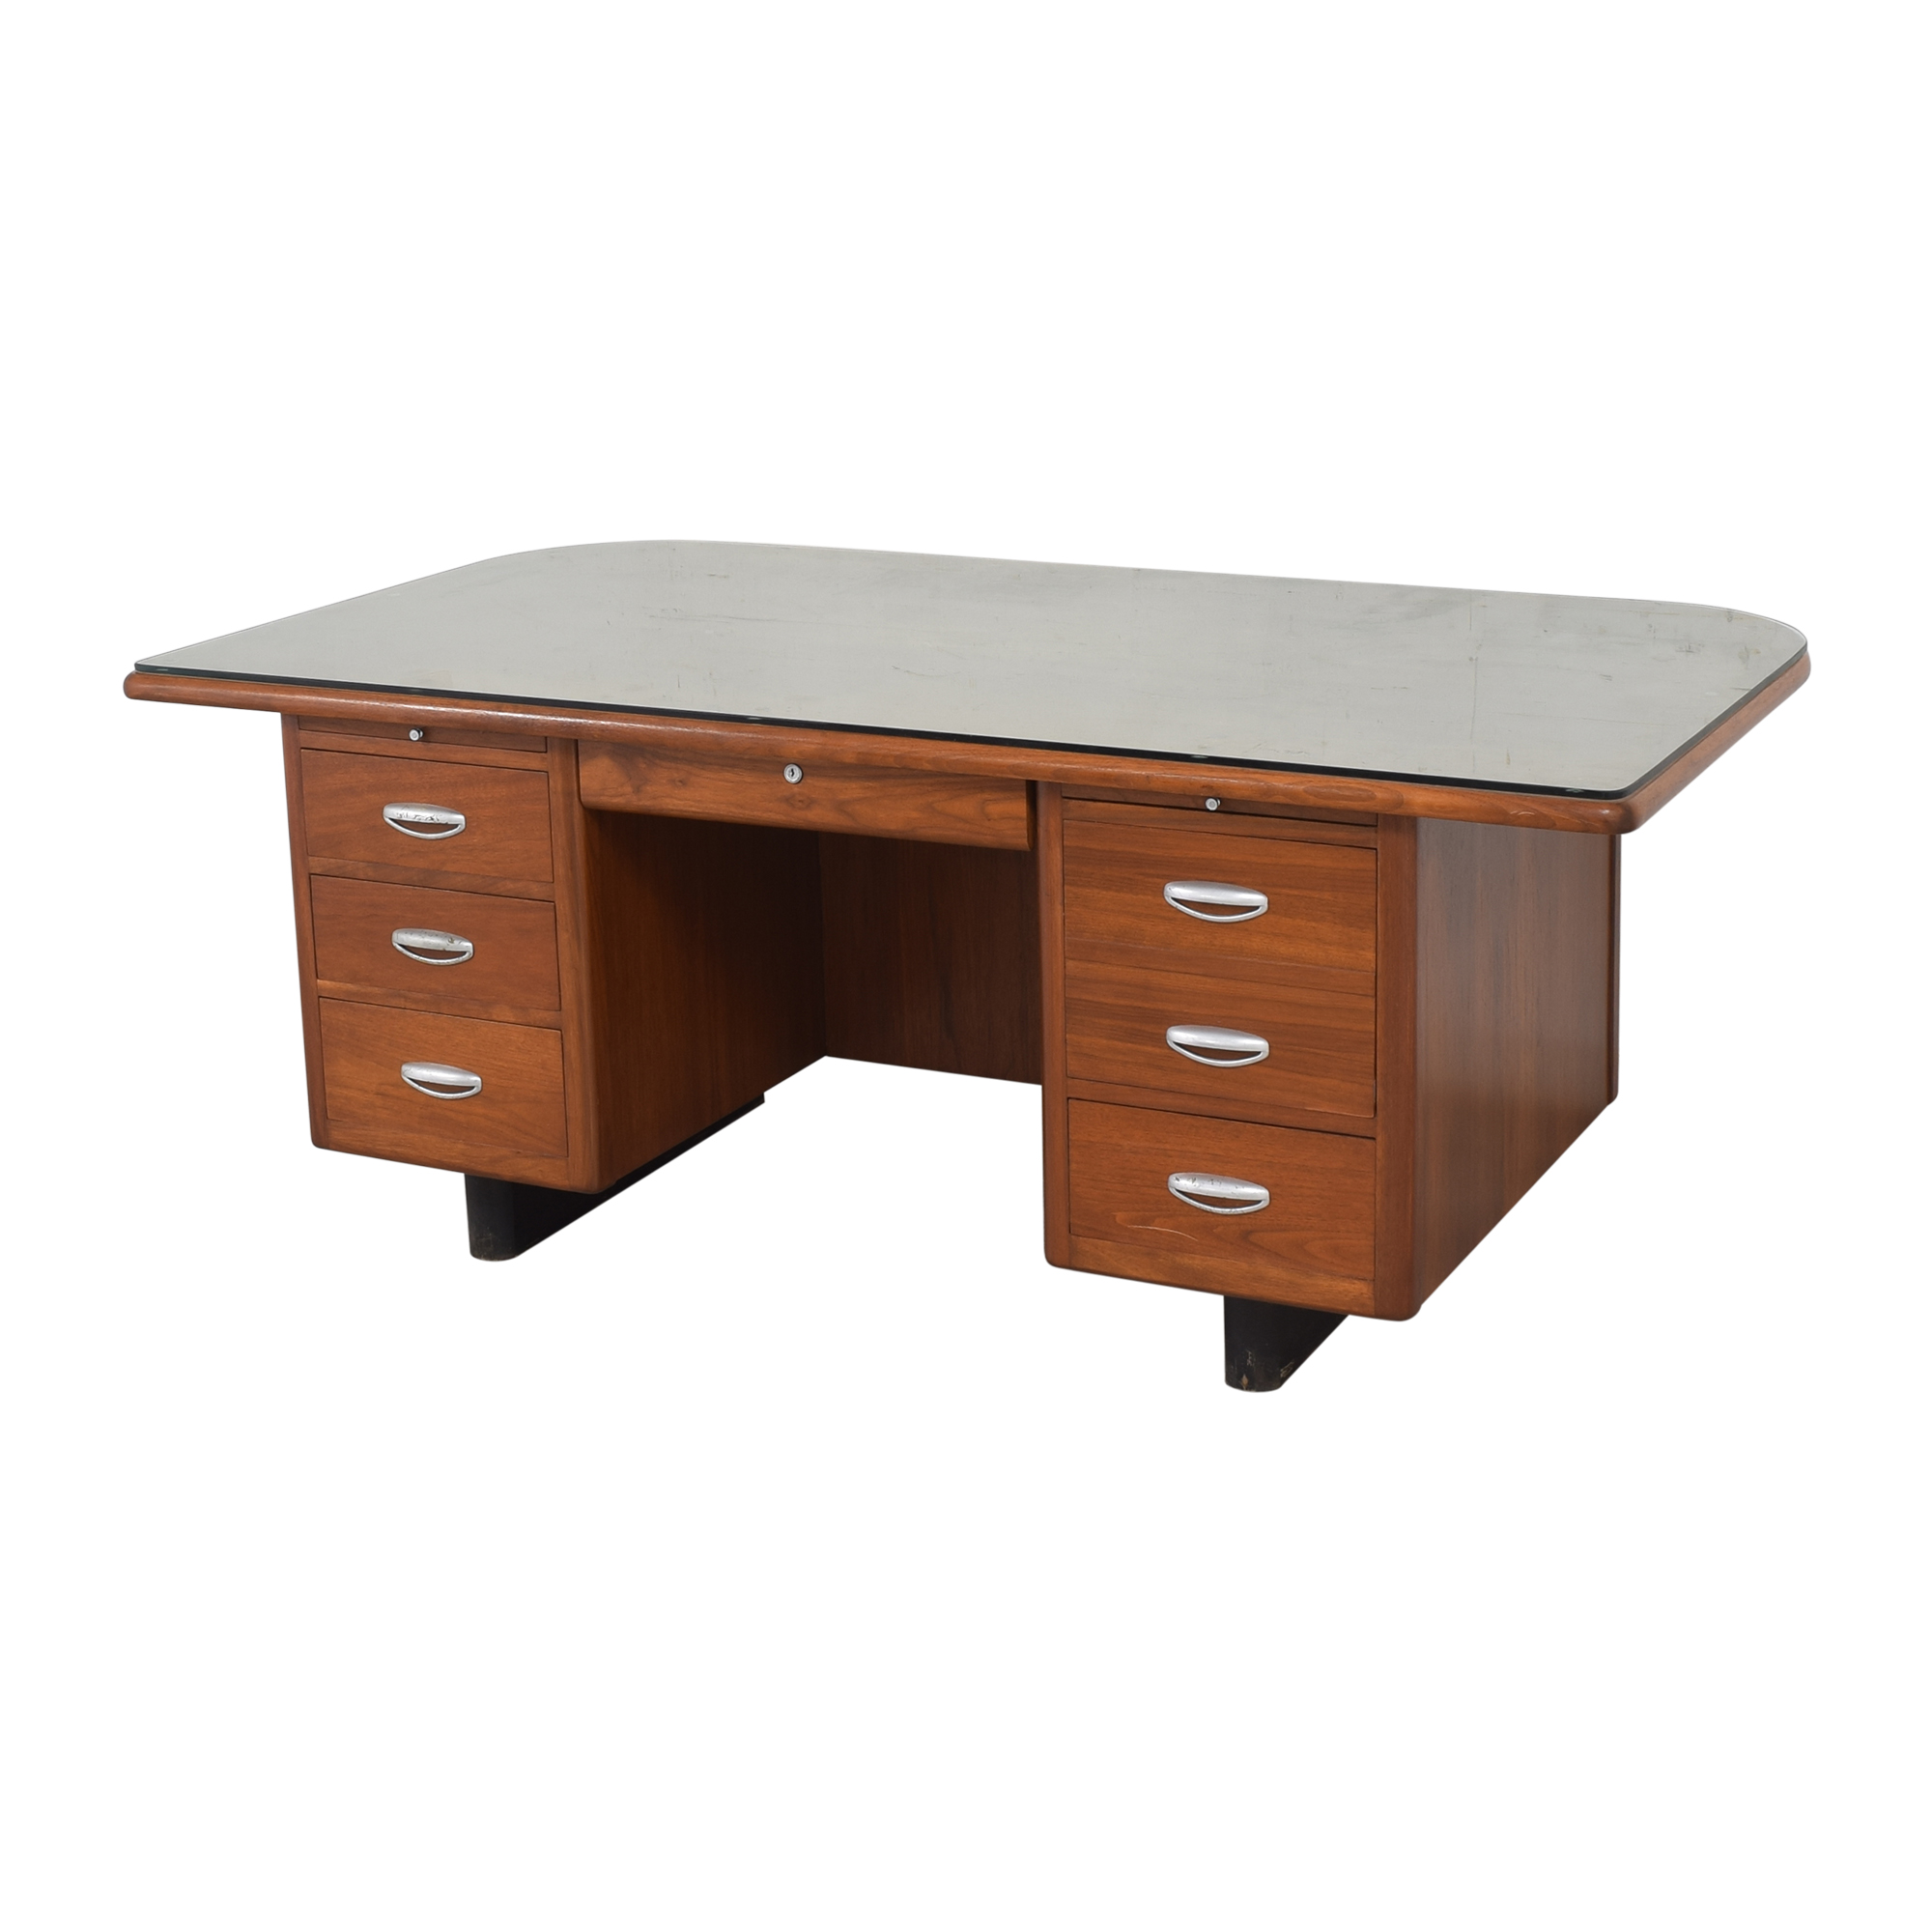 Hoosier Desk Co. Vintage Executive Desk / Tables